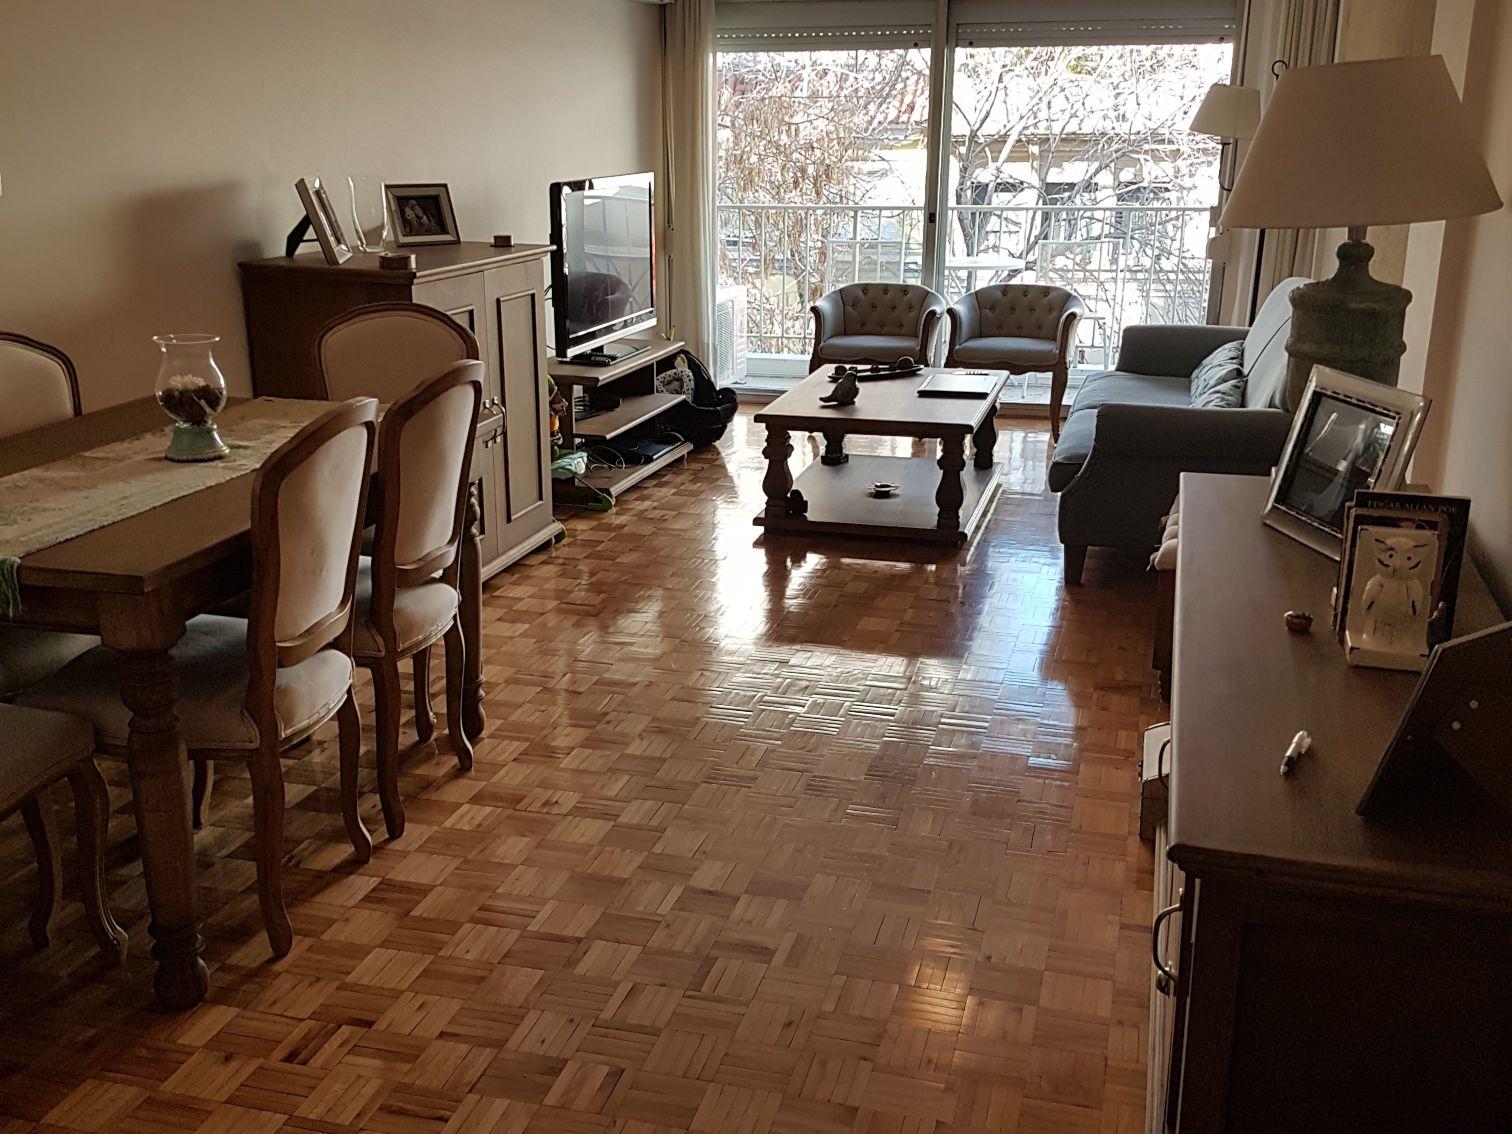 Venta apartamento Pocitos 3 dormitorios